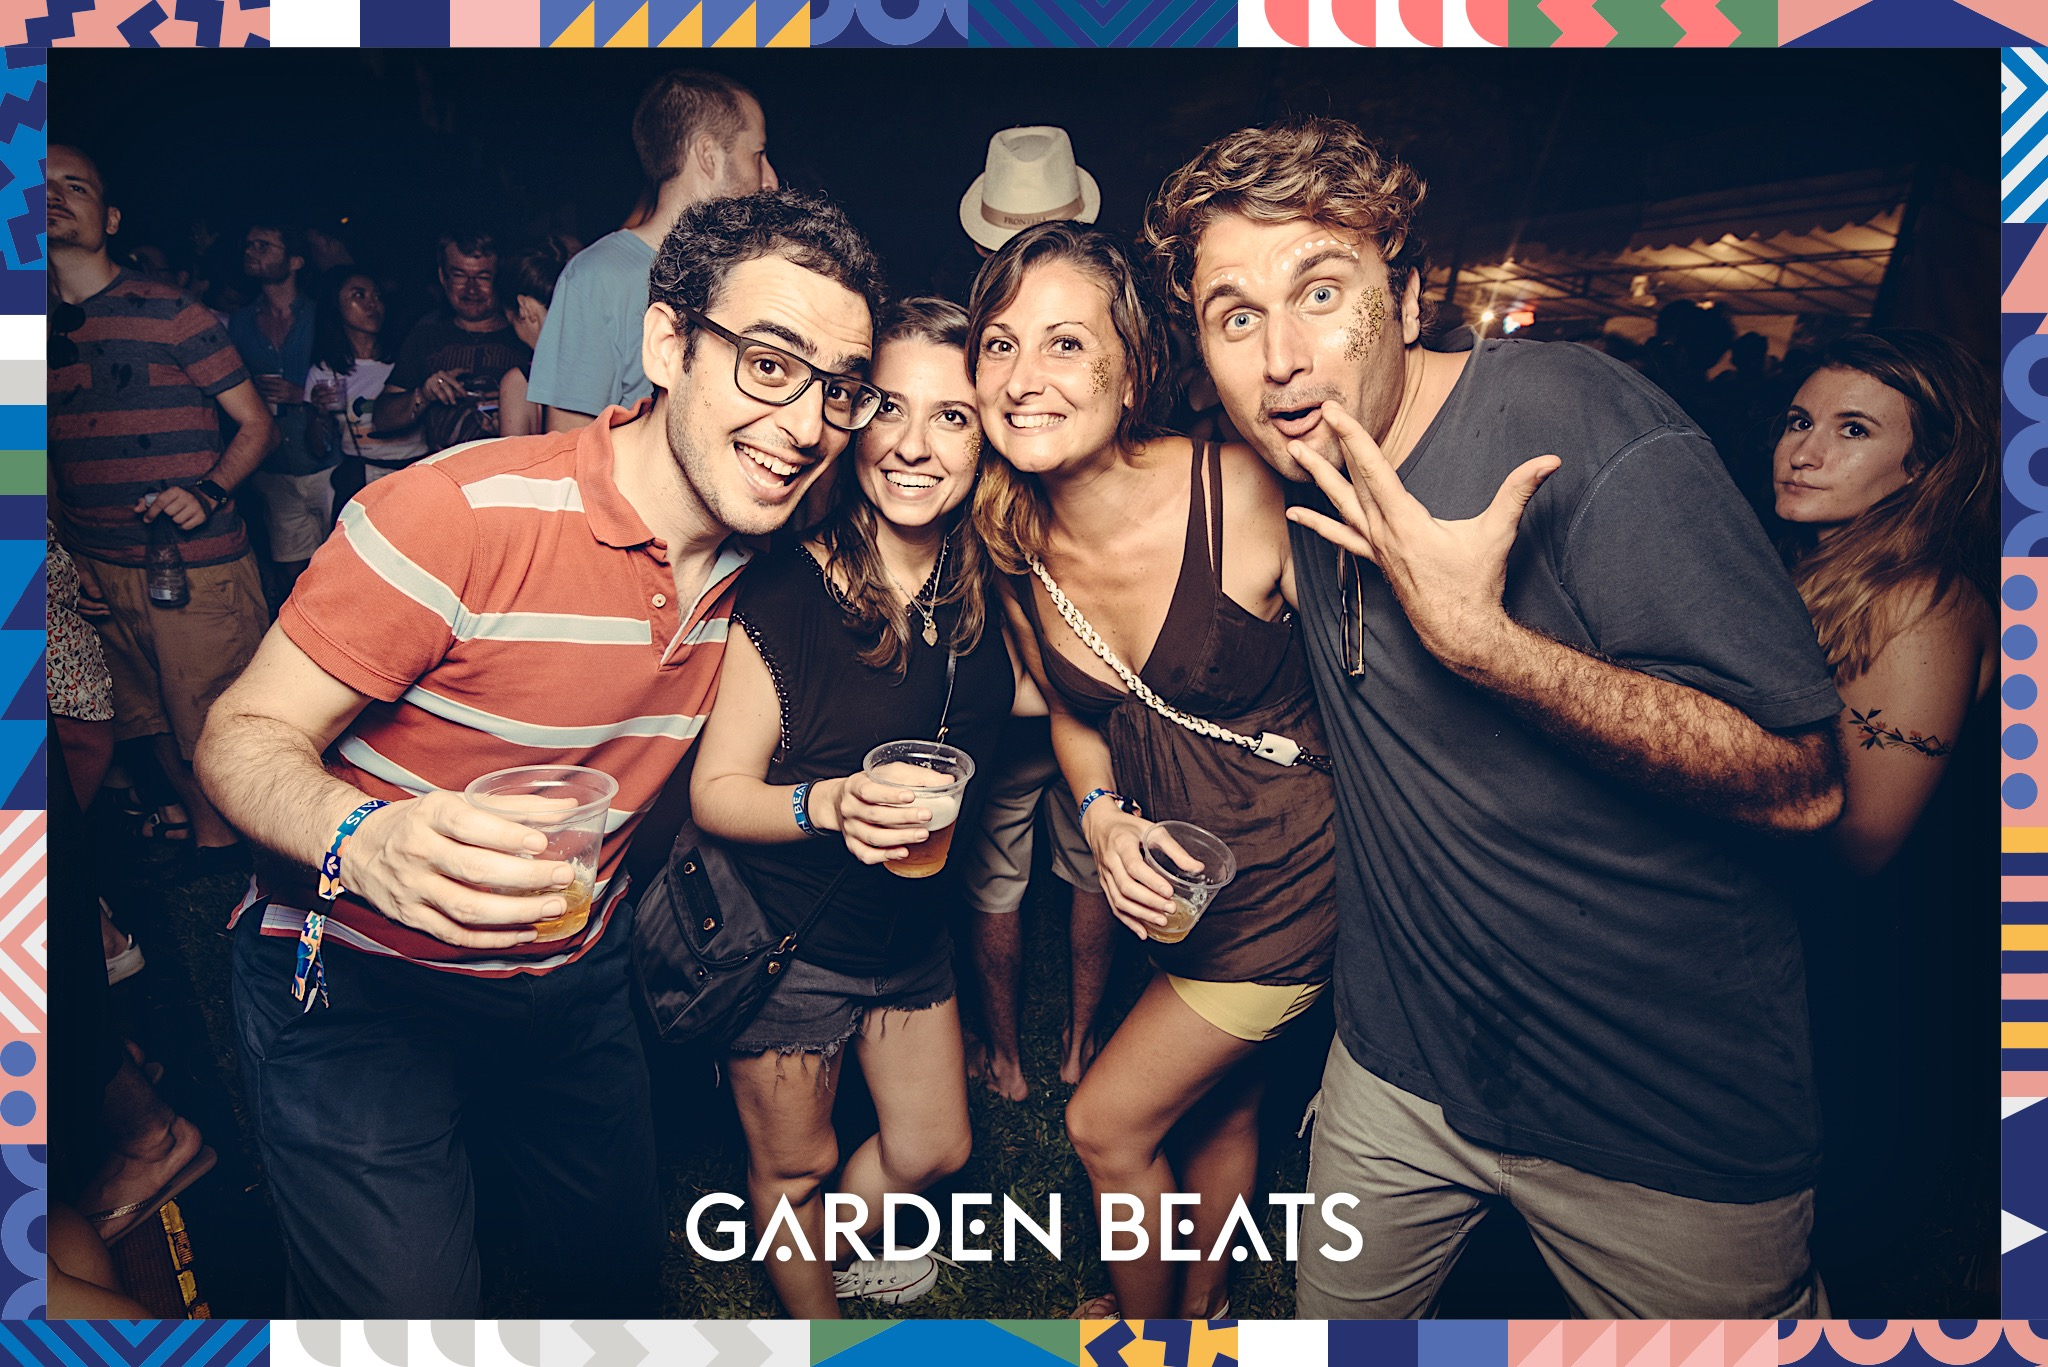 18032017_GardenBeats_Colossal786_WatermarkedGB.jpg